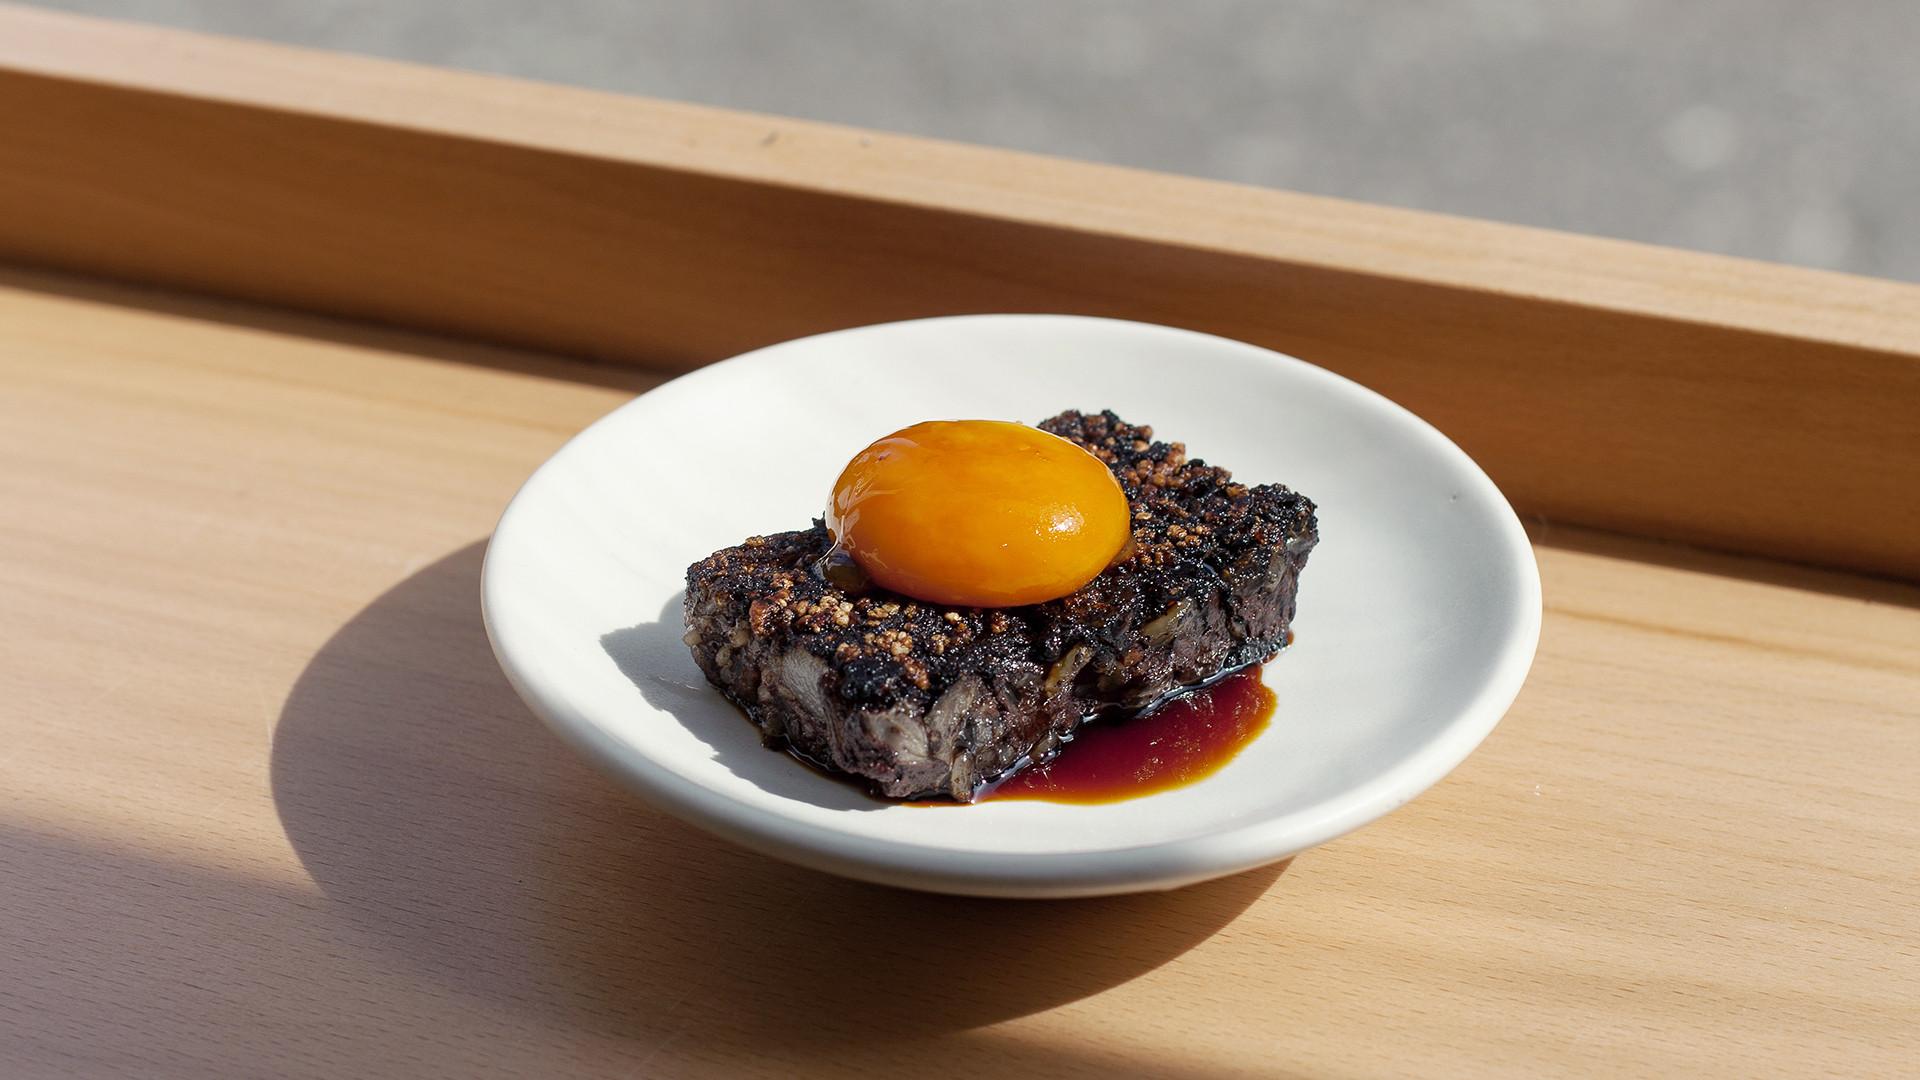 Soho restaurant guide: BAO Soho